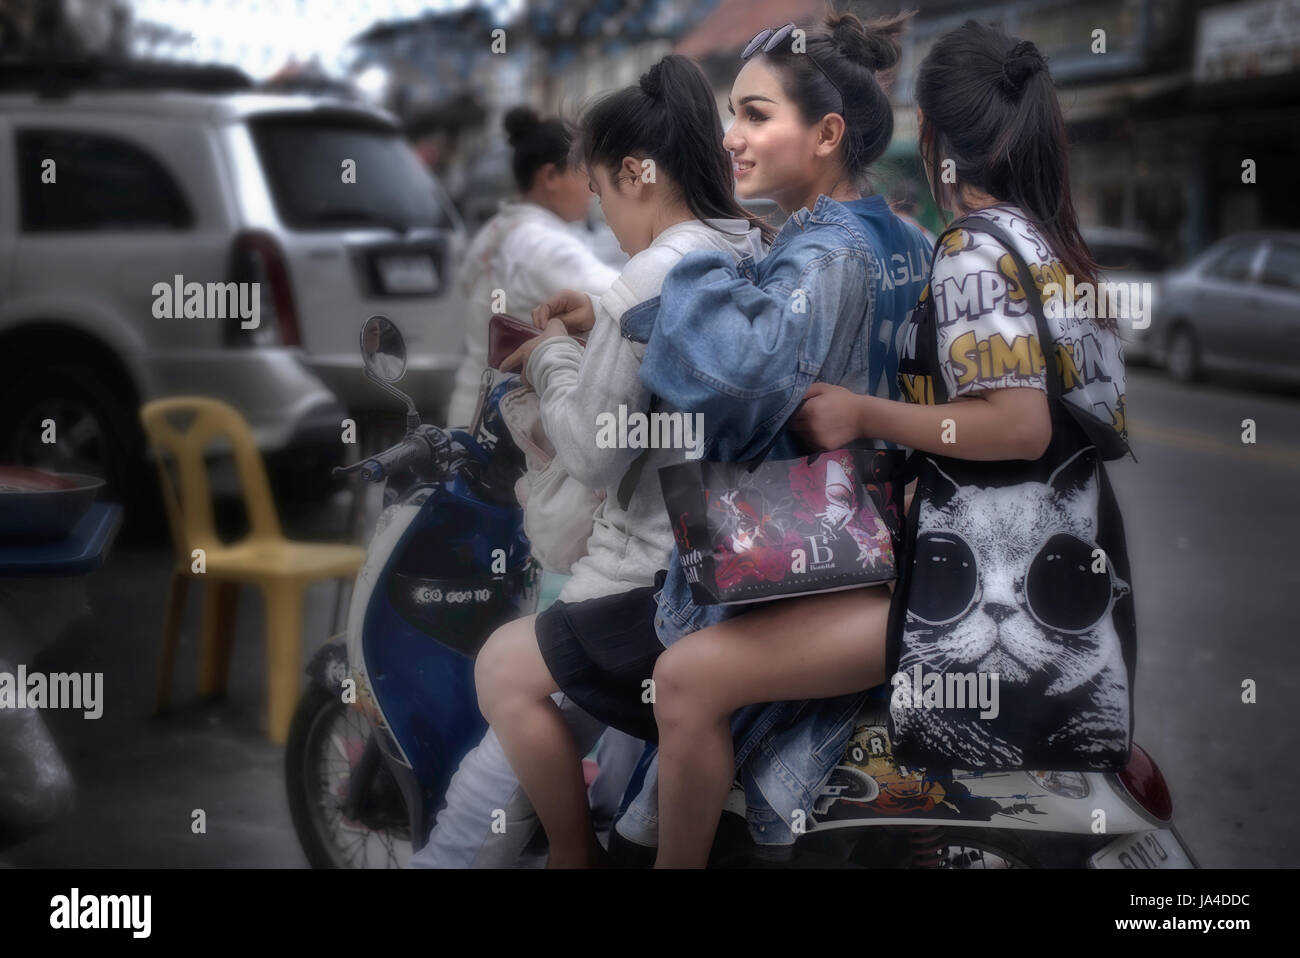 thai-girl-riding-boy-first-night-xxxgirls